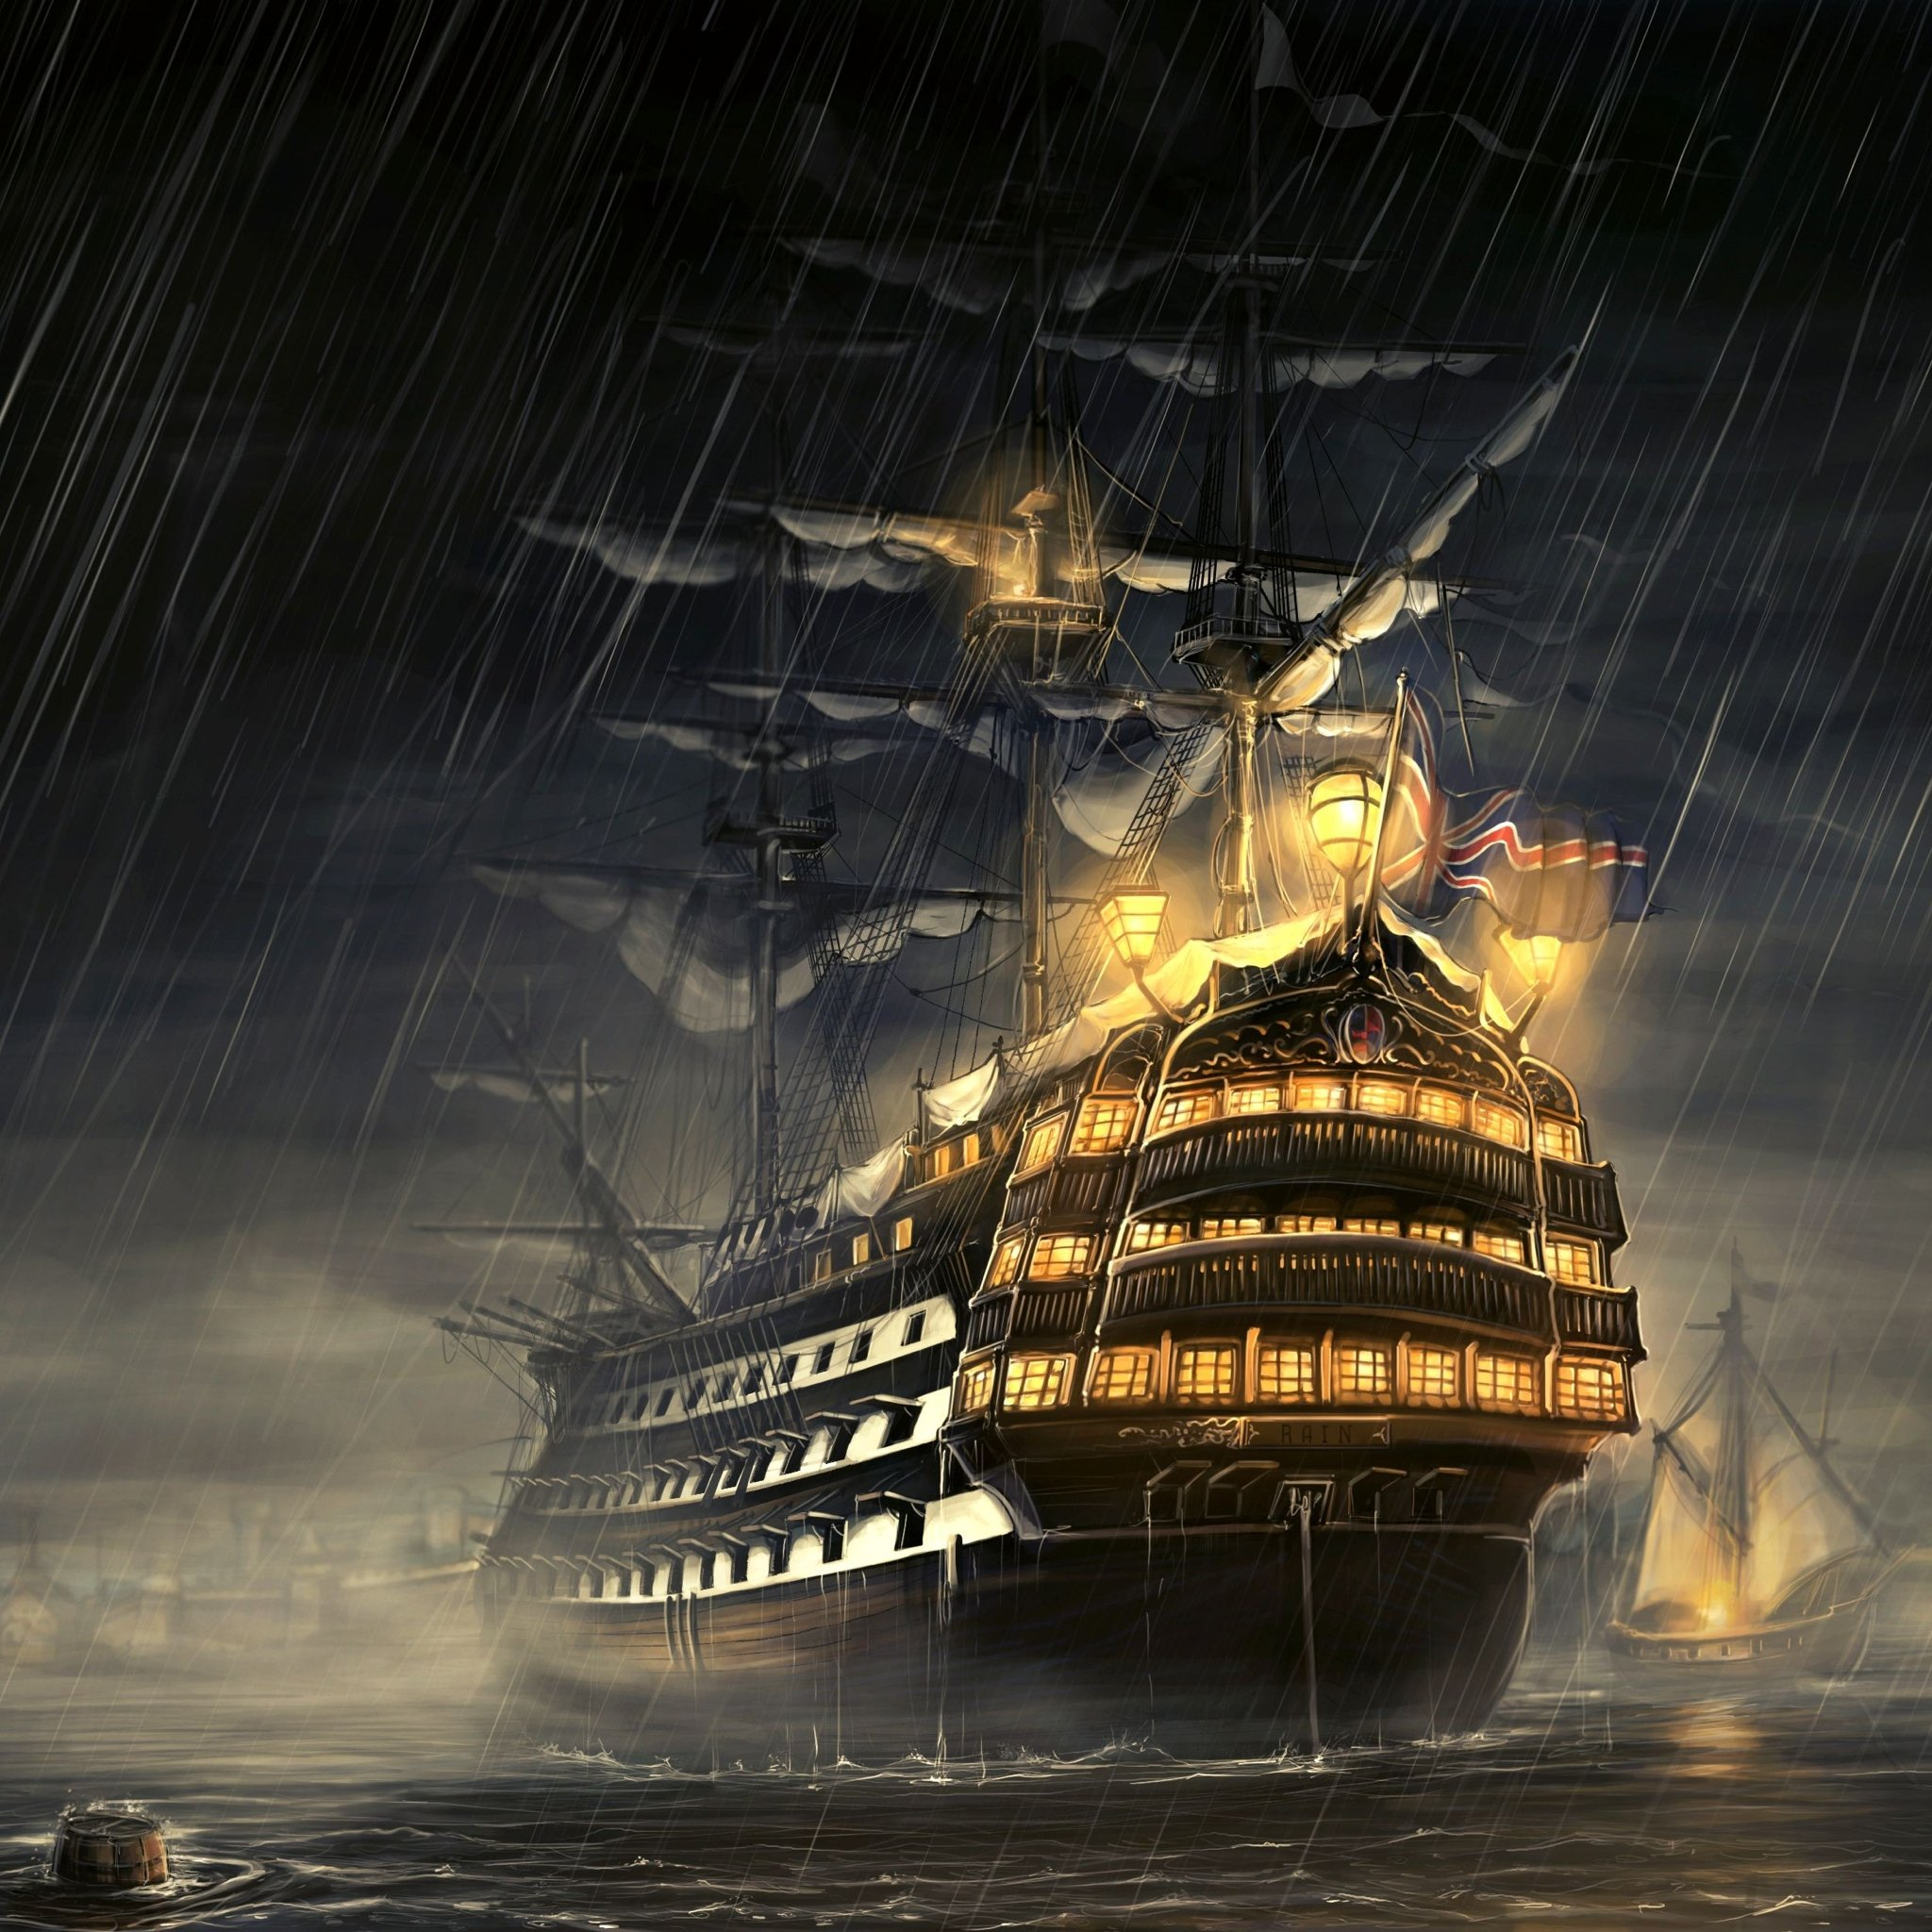 Pirate Ship IPad Air Wallpaper Download IPhone Wallpapers 2048x2048